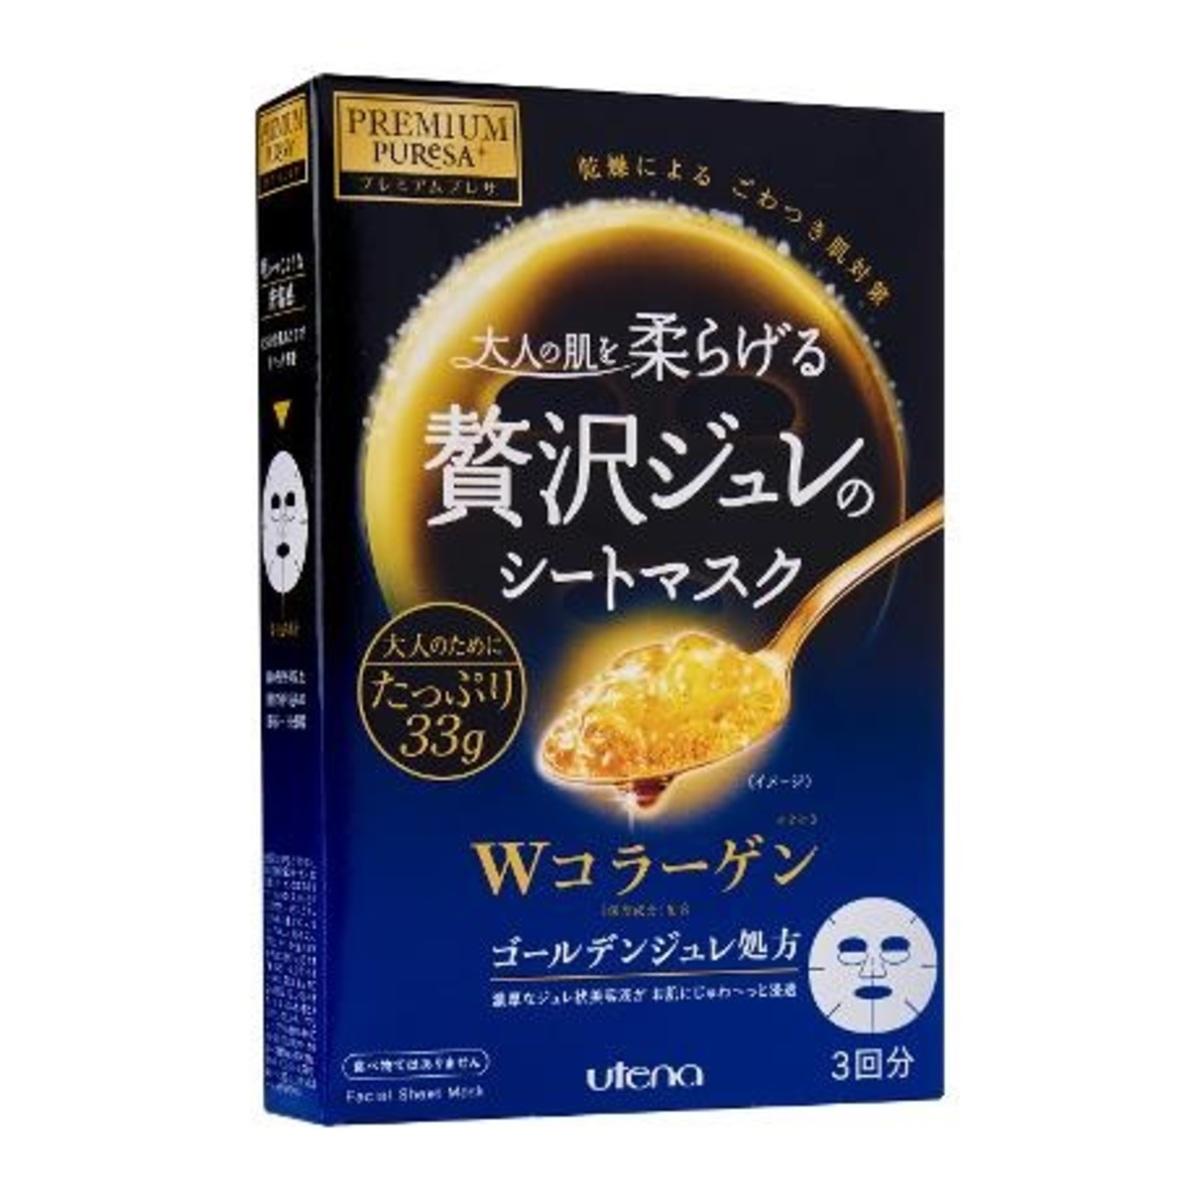 Utena - 日本 佑天蘭 Utena Premium Puresa 黃金凝膠面膜(雙重膠原蛋白)(藍色)3片裝